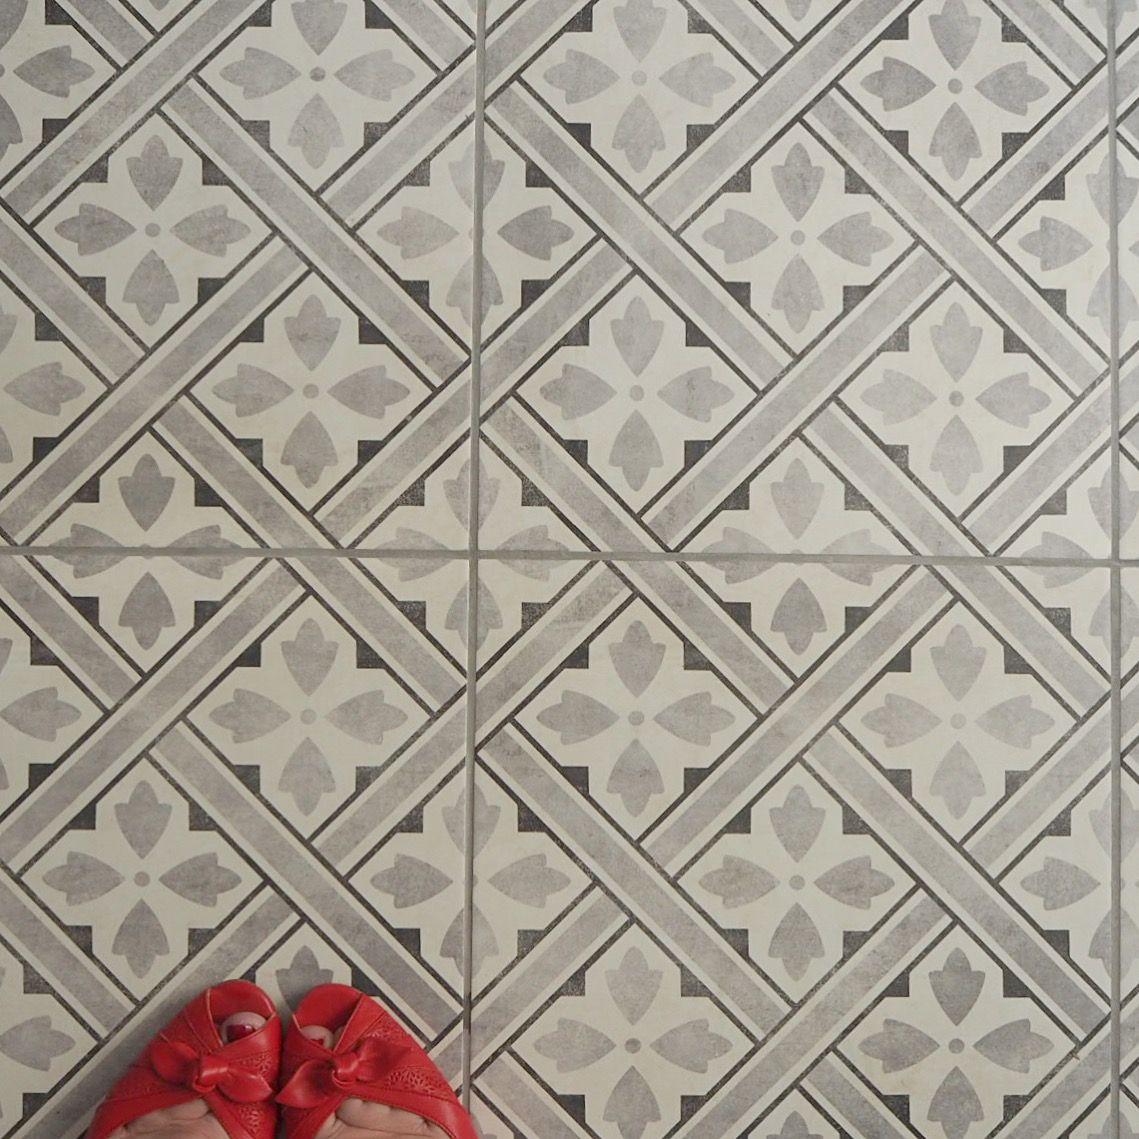 Laura ashley mr jones grey patterned floor tiles charcoal bathroom laura ashley mr jones grey patterned floor tiles charcoal bathroom inspo dailygadgetfo Images